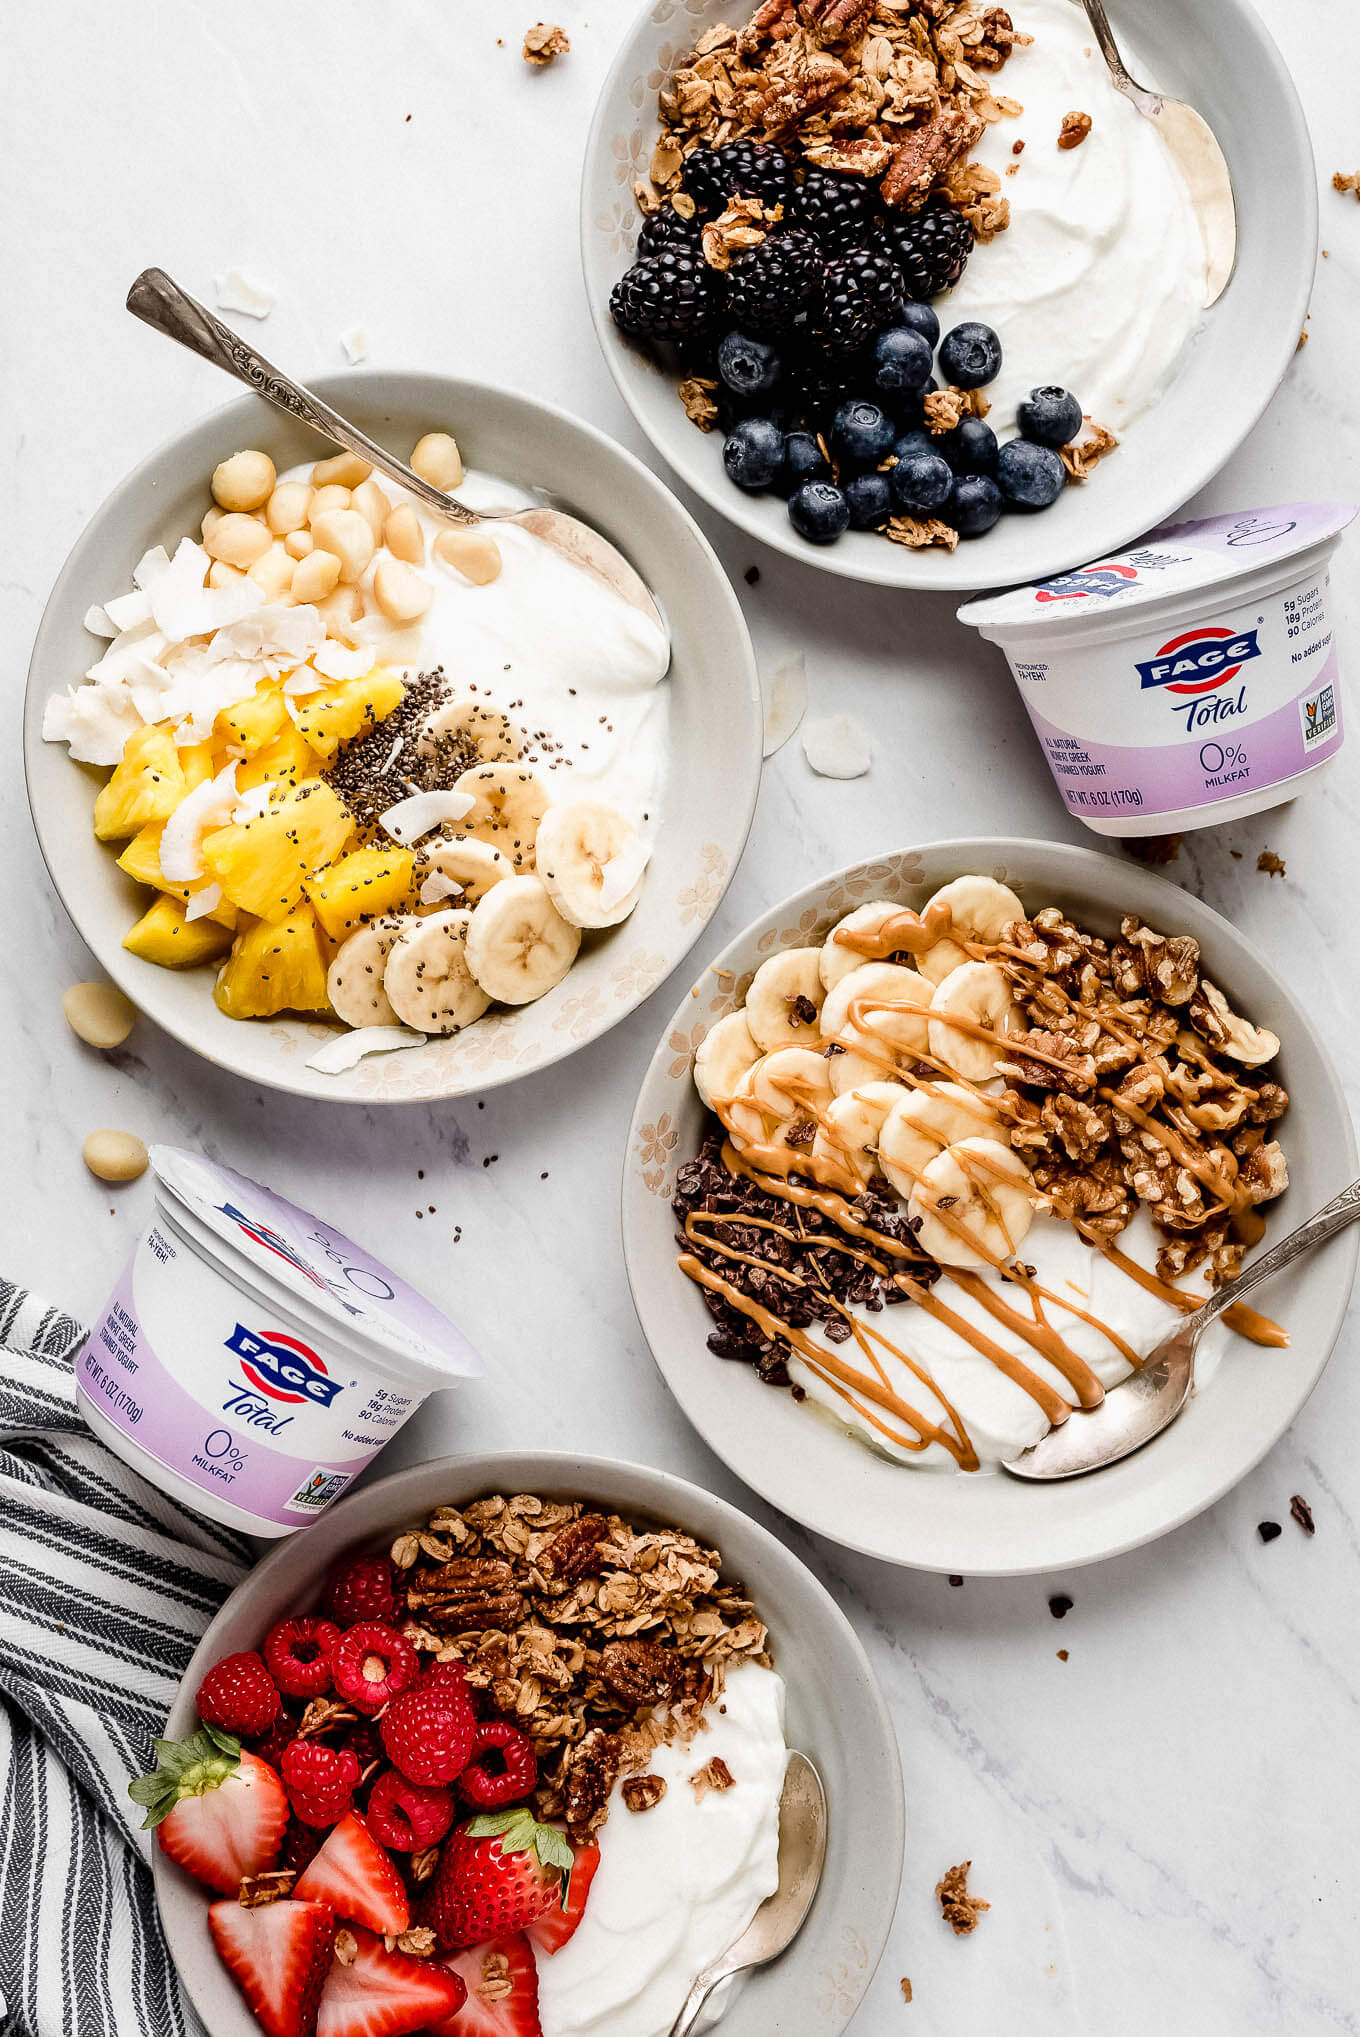 Blueberry yogurt bowl, Tropical yogurt bowl, chunky monkey yogurt bowl, and red berry yogurt bowl.